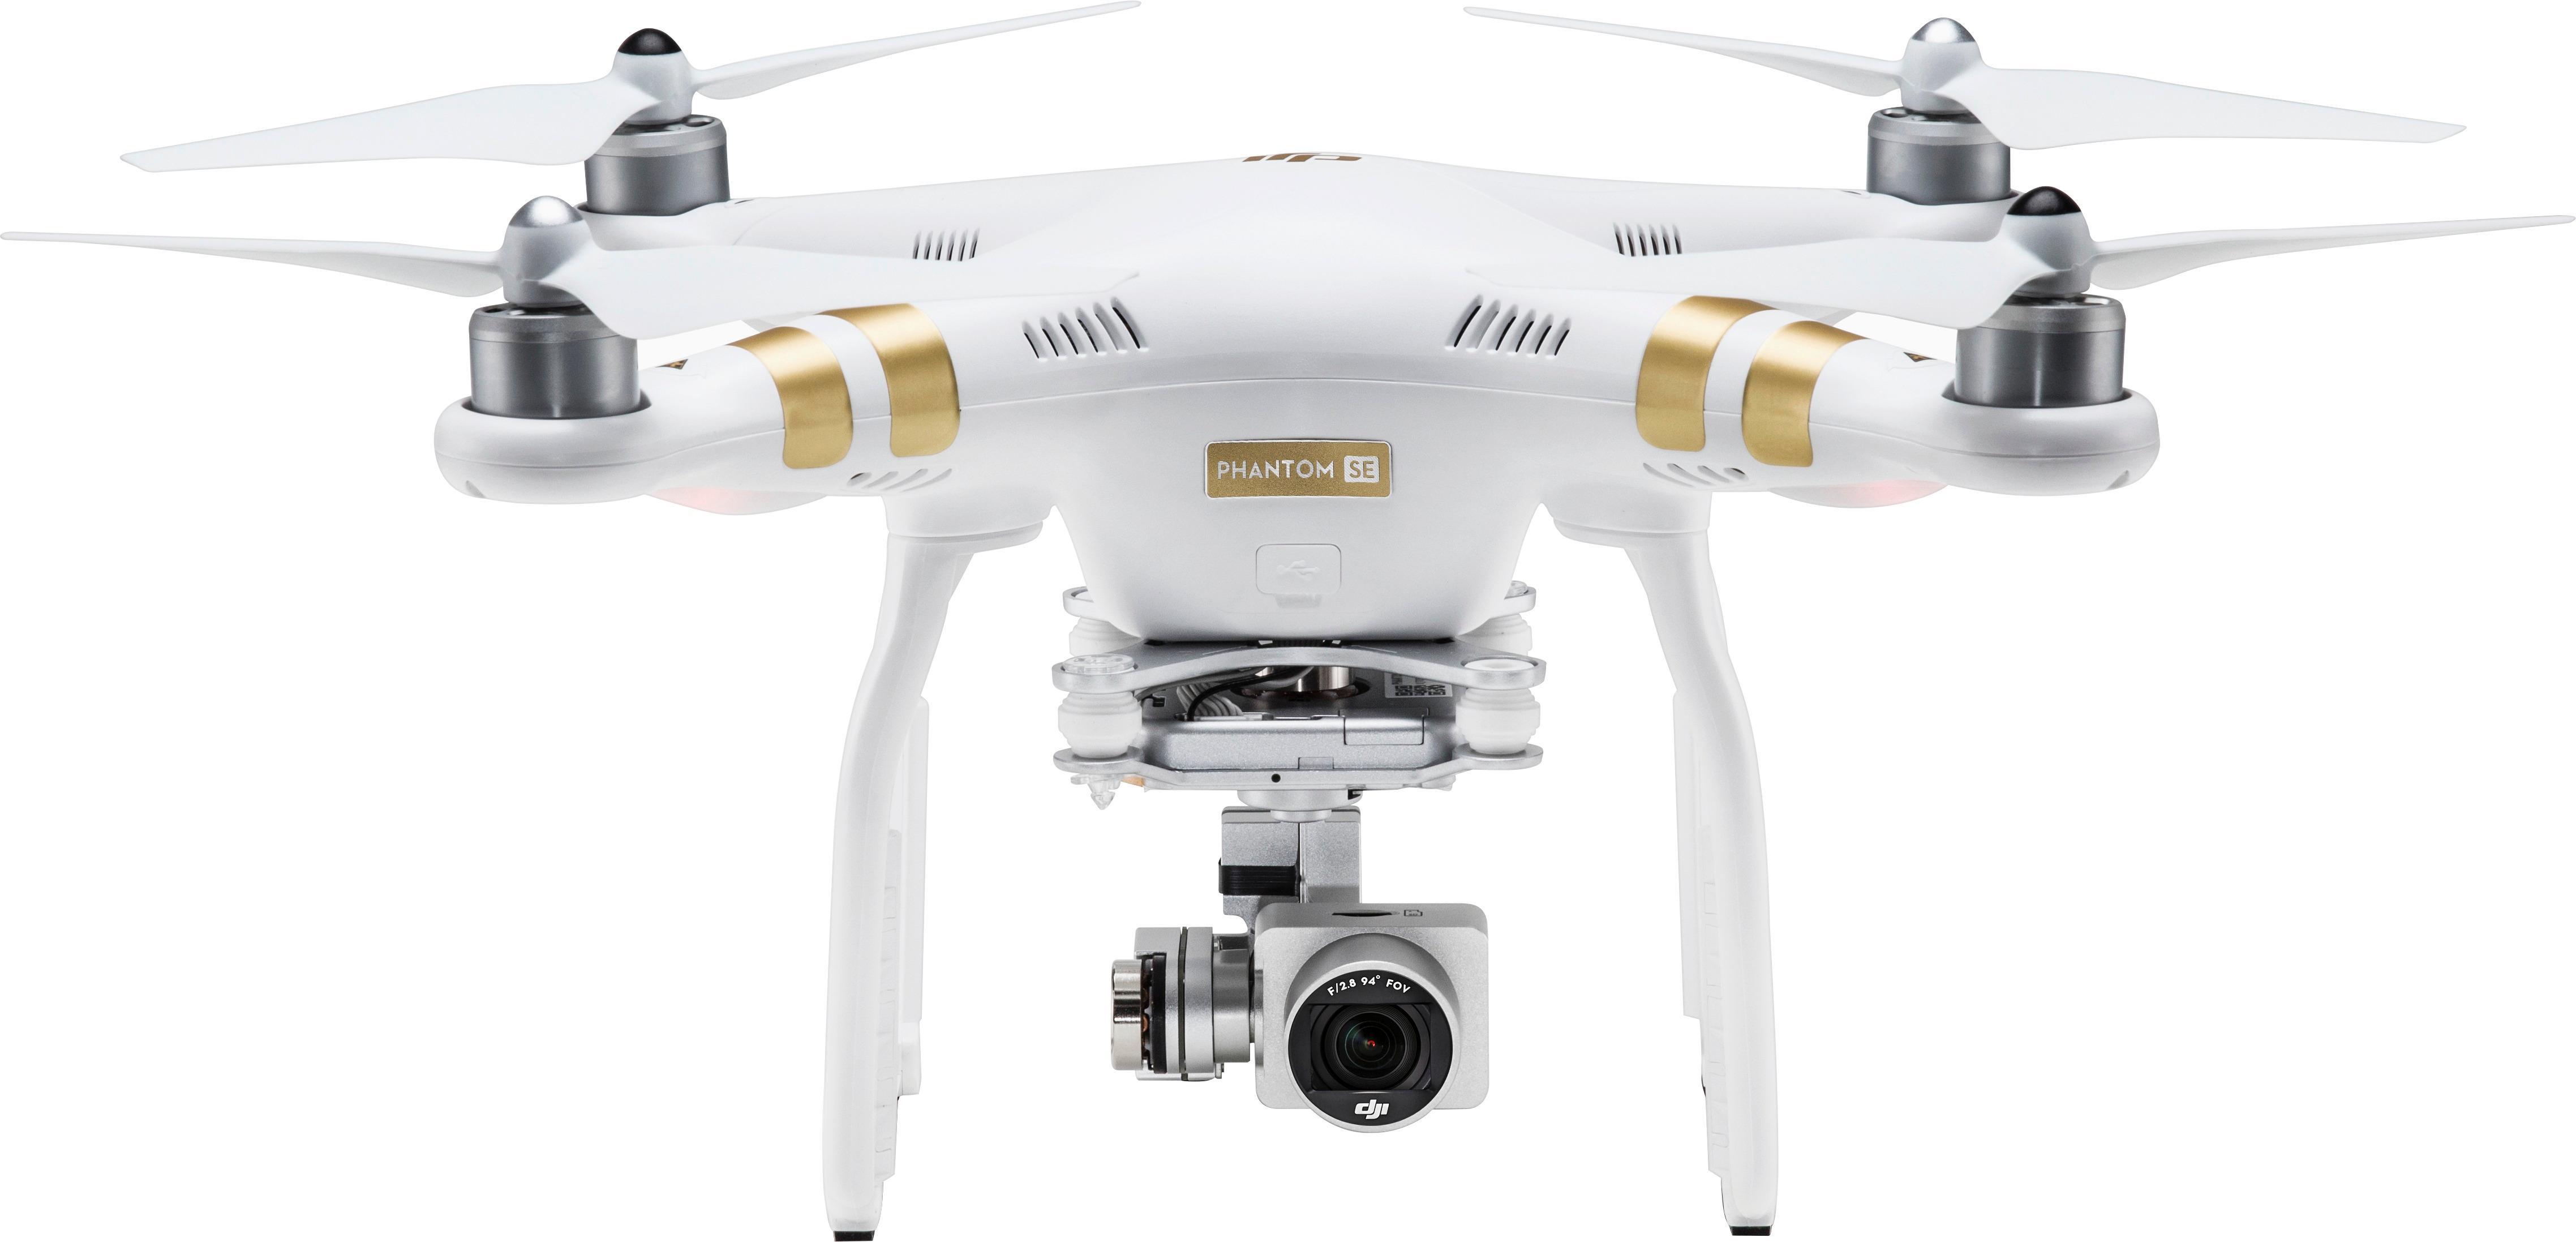 Best Buy Dji Phantom 3 Se Quadcopter White And Yellow Cp Pt 000711